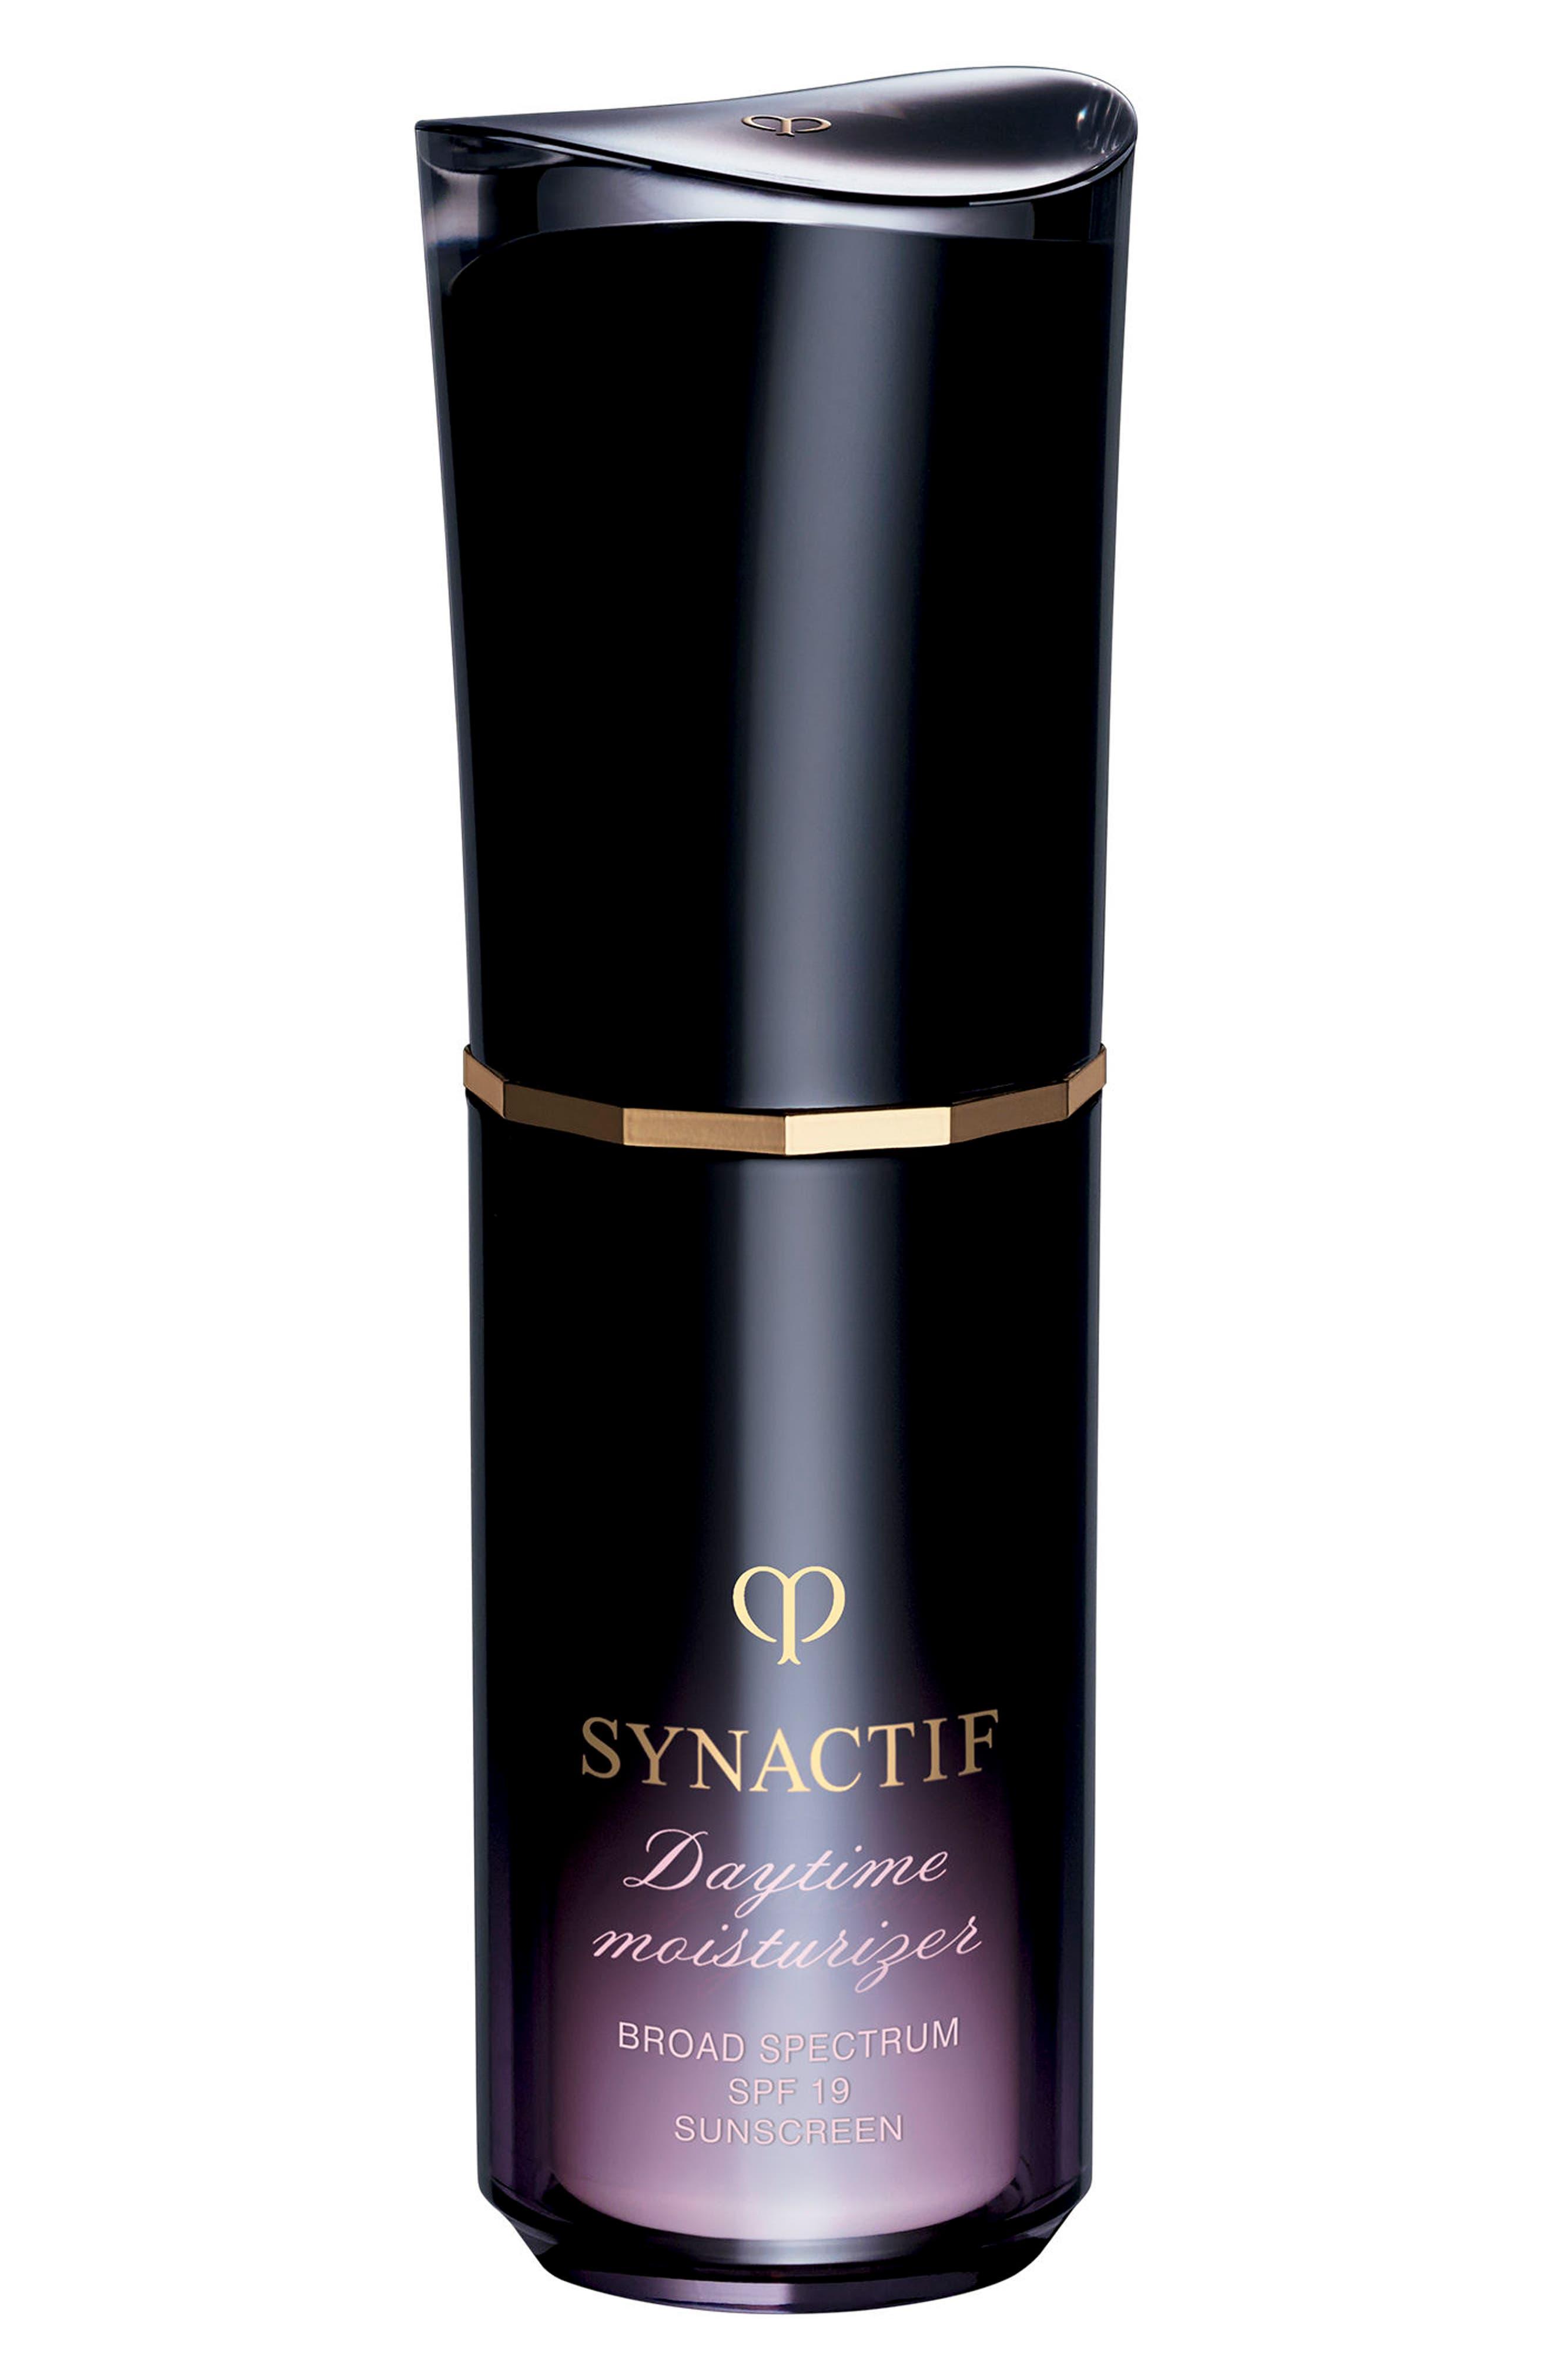 'Synactif' Daytime Moisturizer Broad Spectrum SPF 19 Sunscreen,                         Main,                         color, NO COLOR